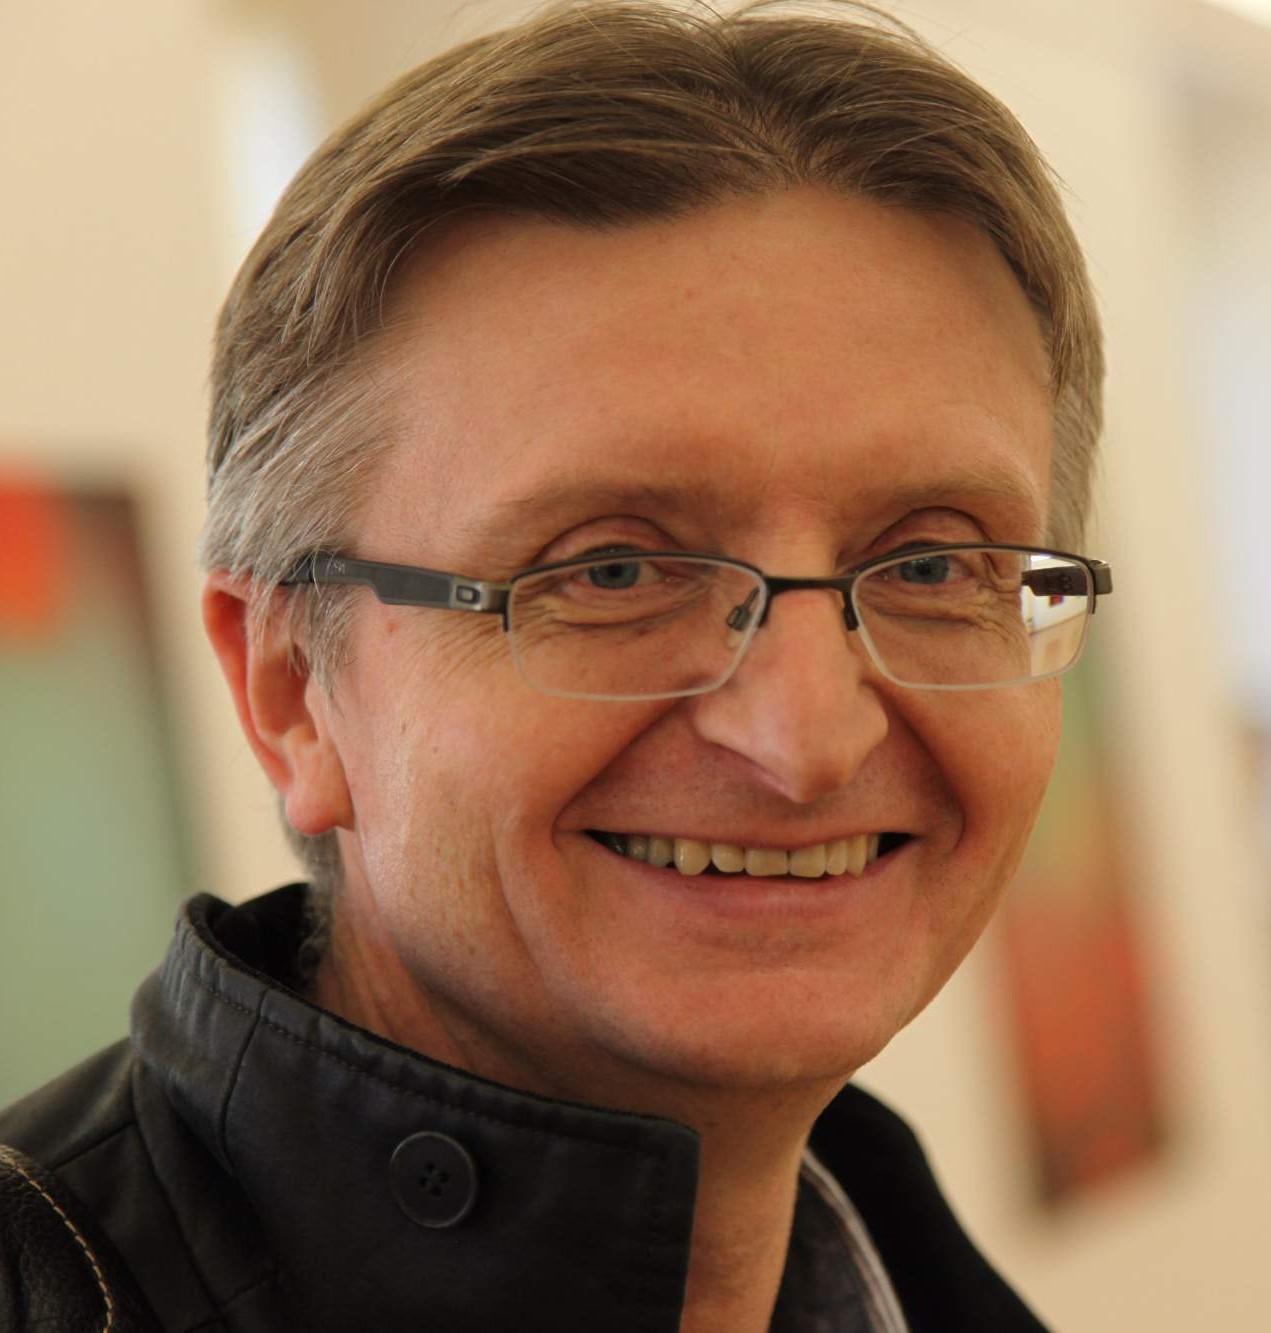 Pavel Mohr